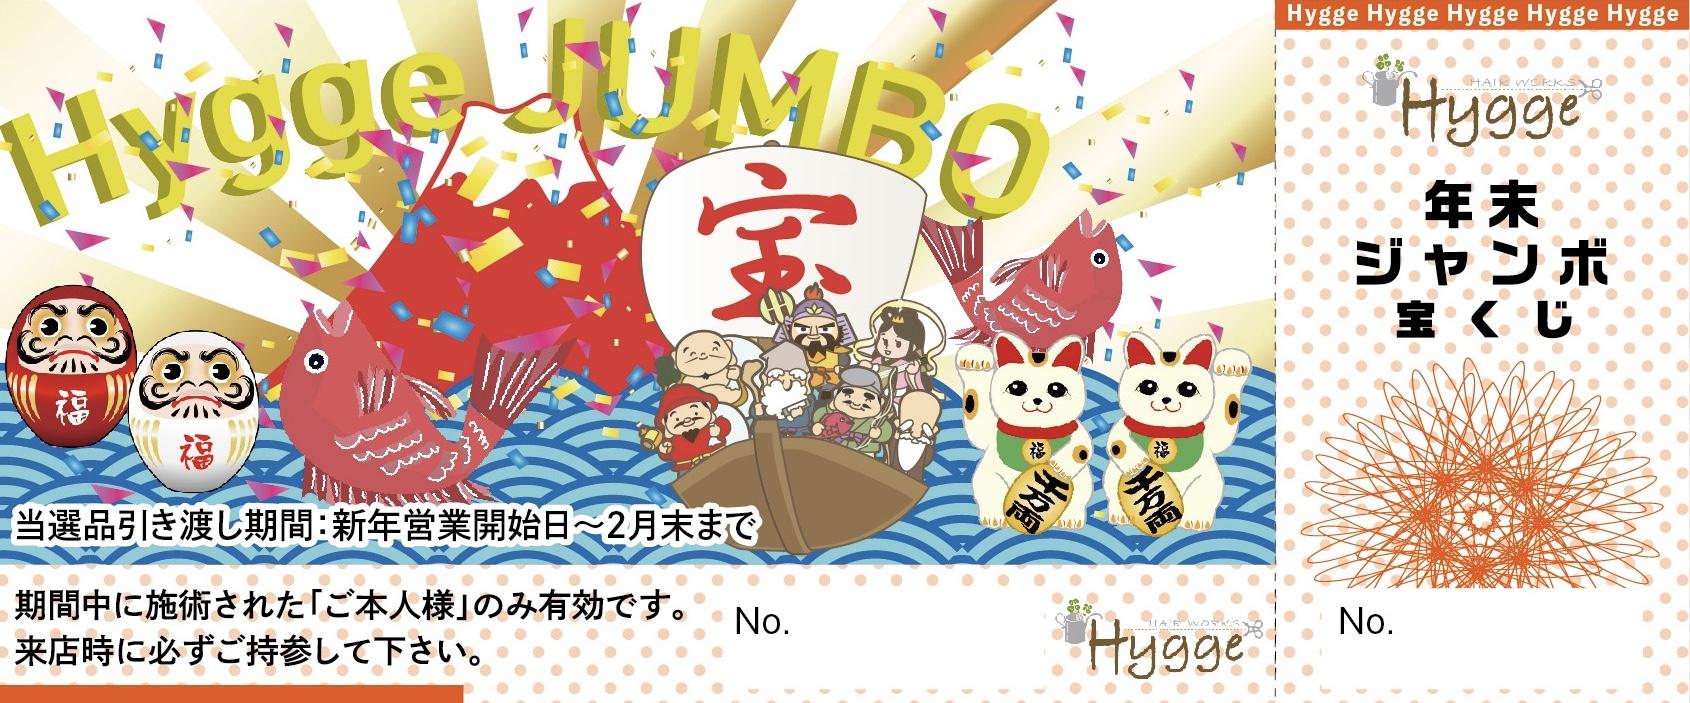 Hygge様 宝くじ2019